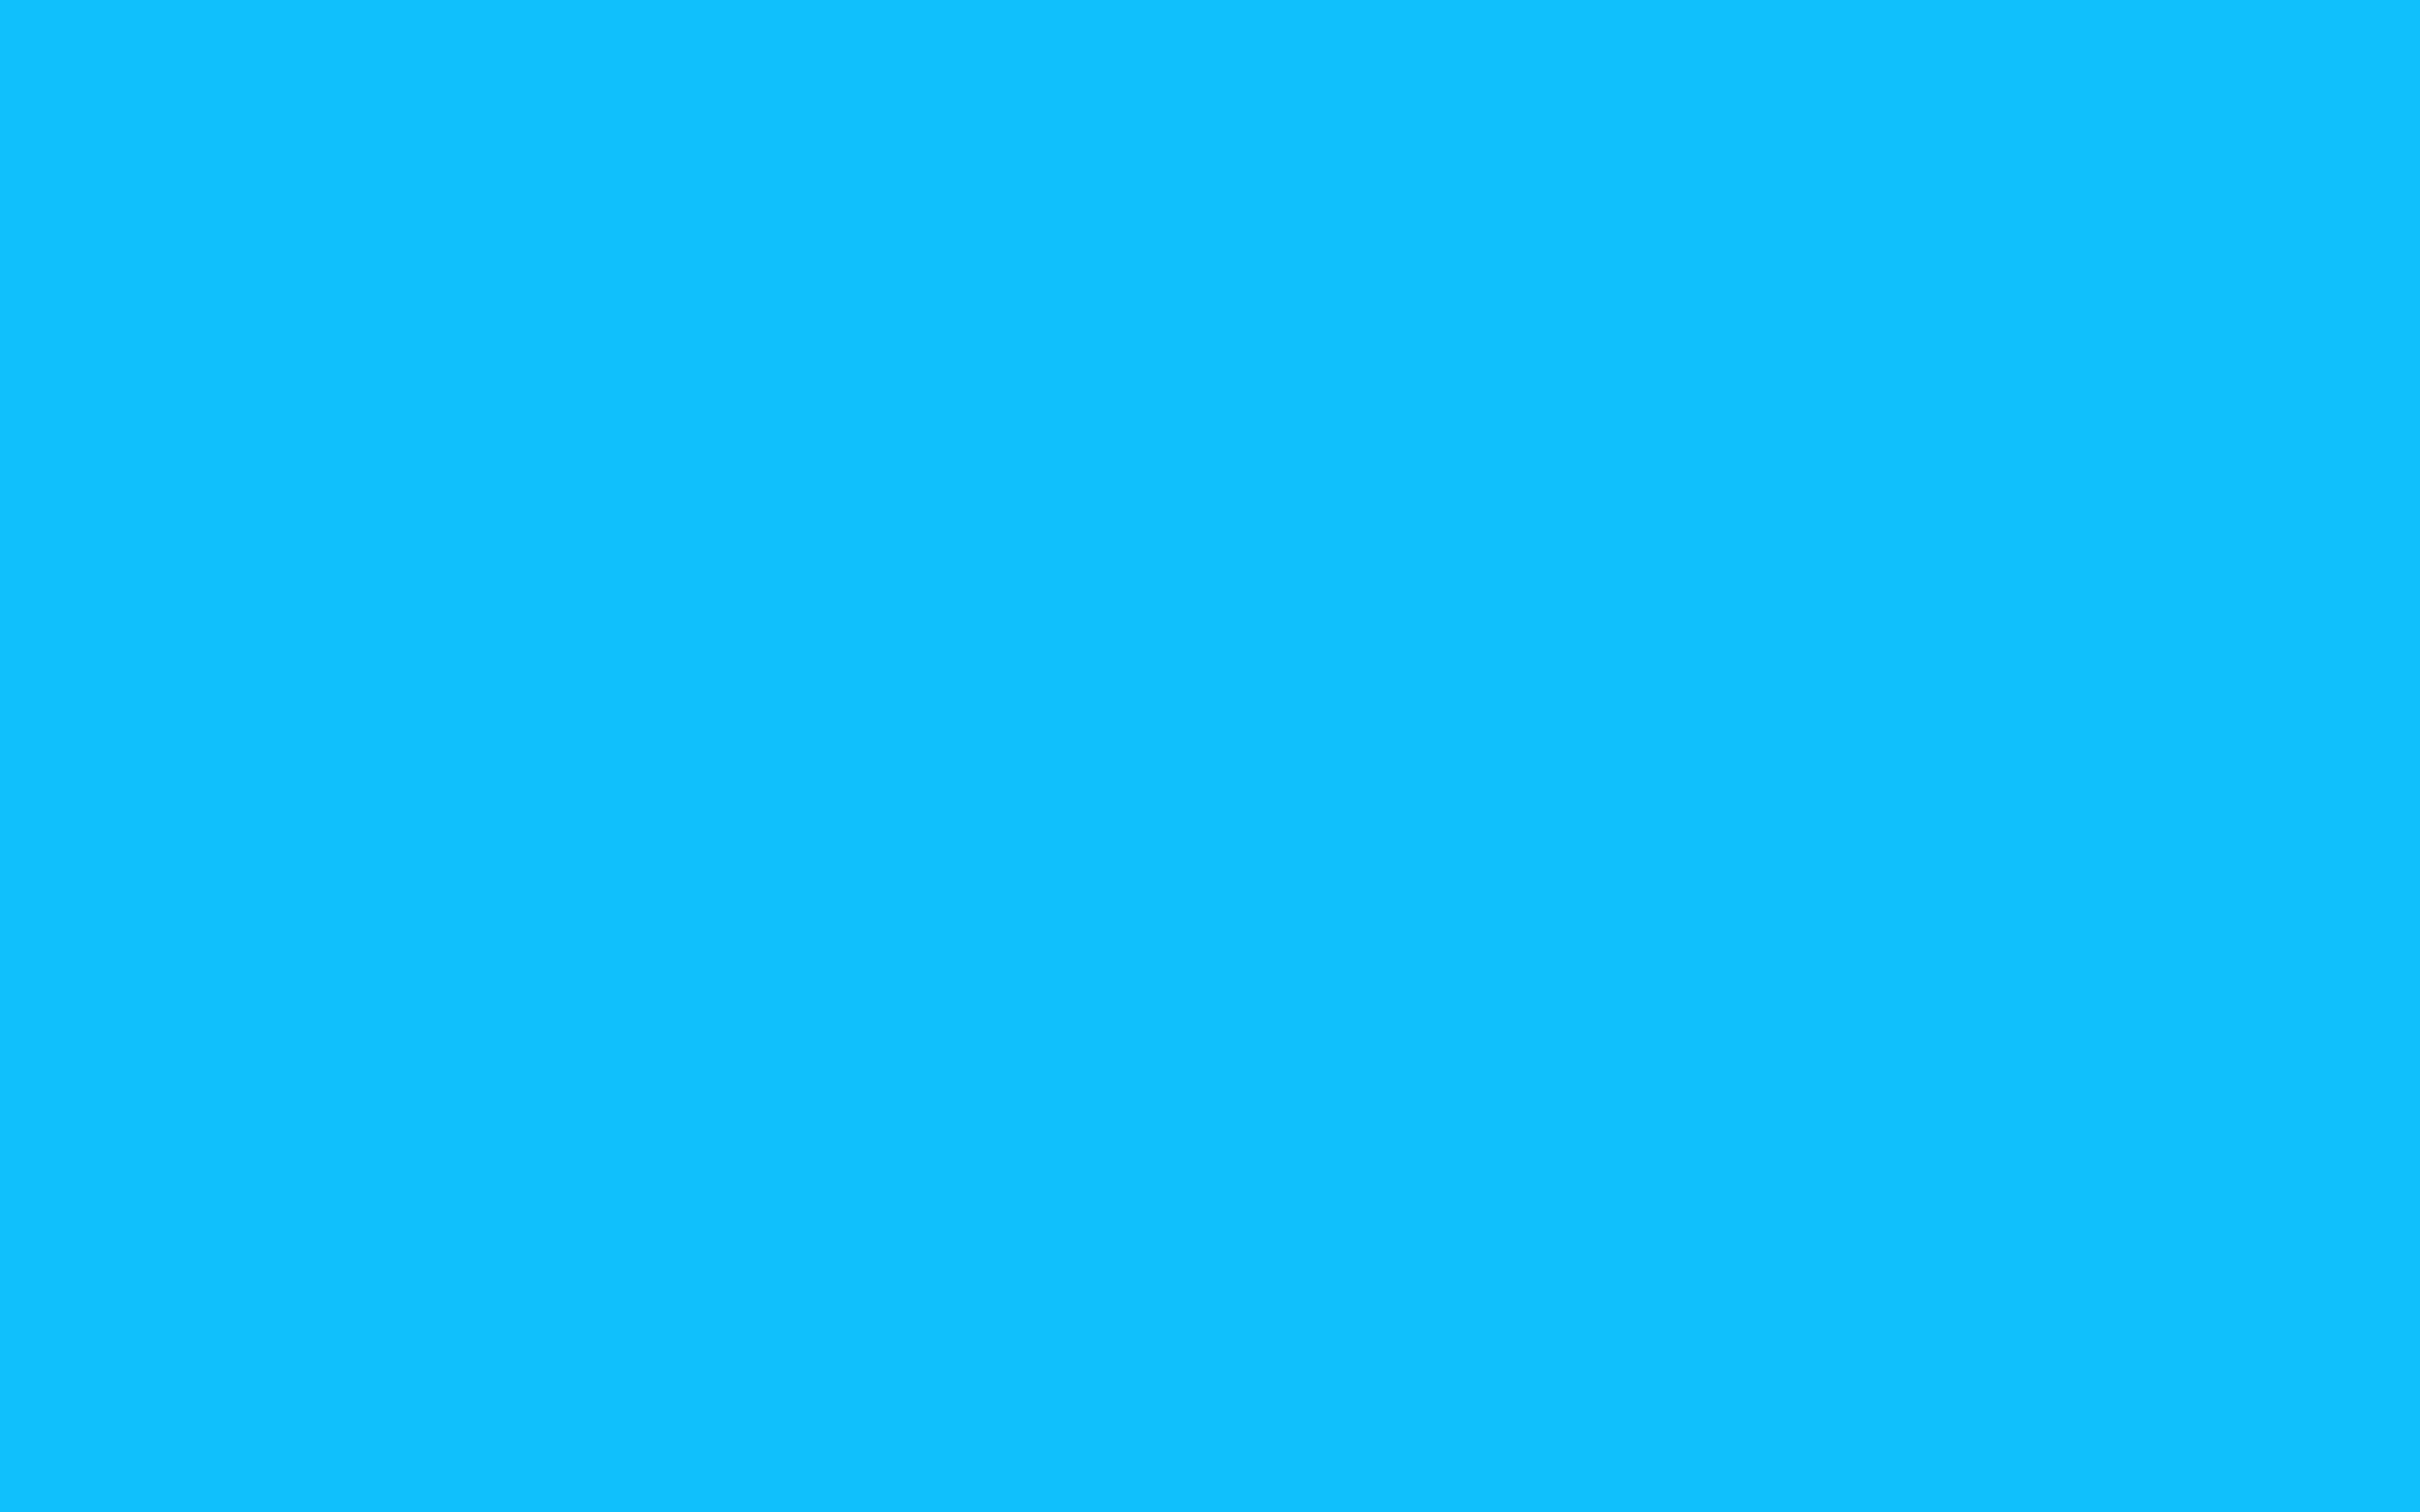 2560x1600 Spiro Disco Ball Solid Color Background